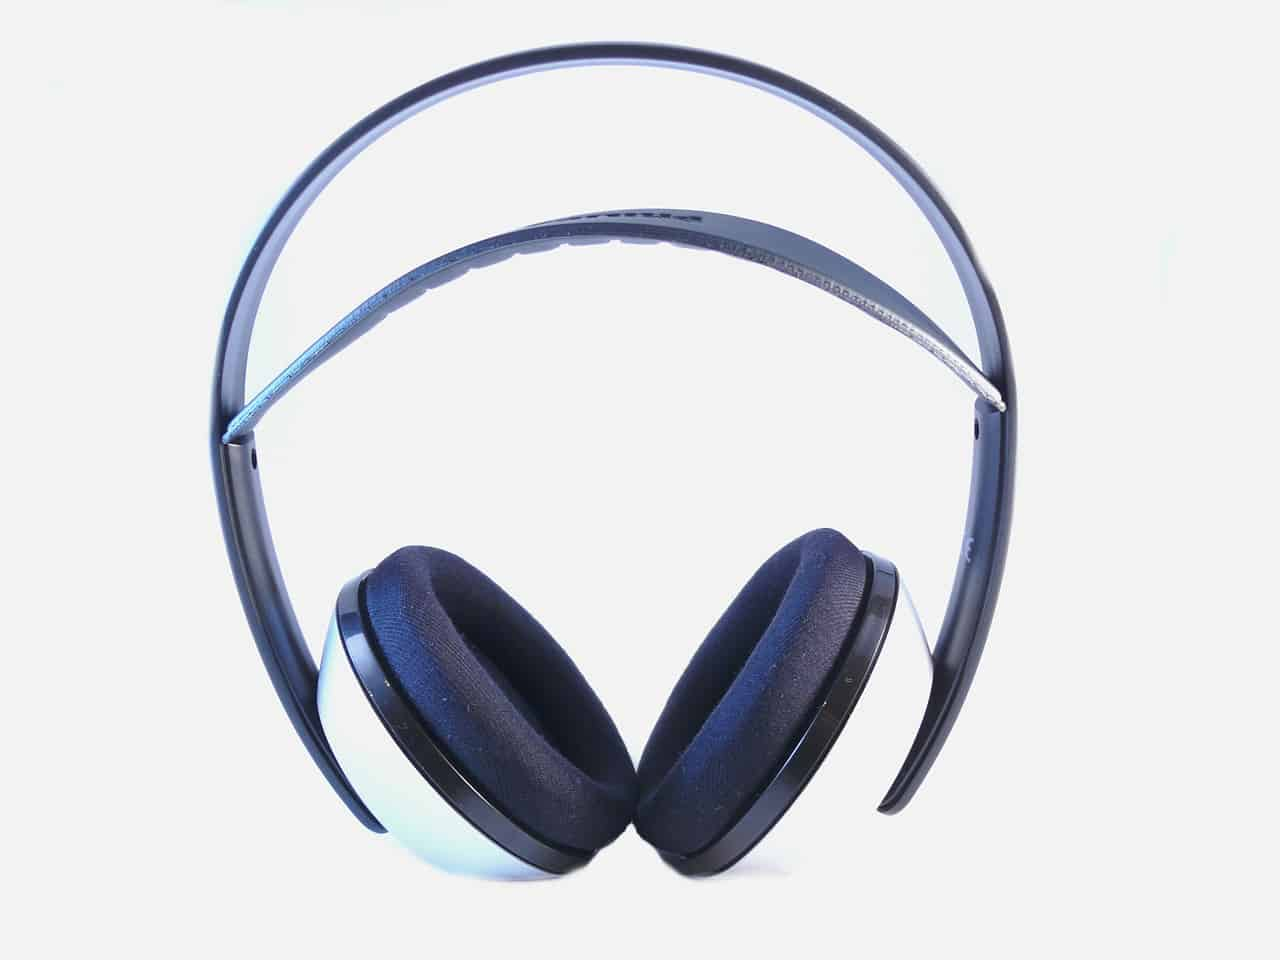 Bluetooth headphone set